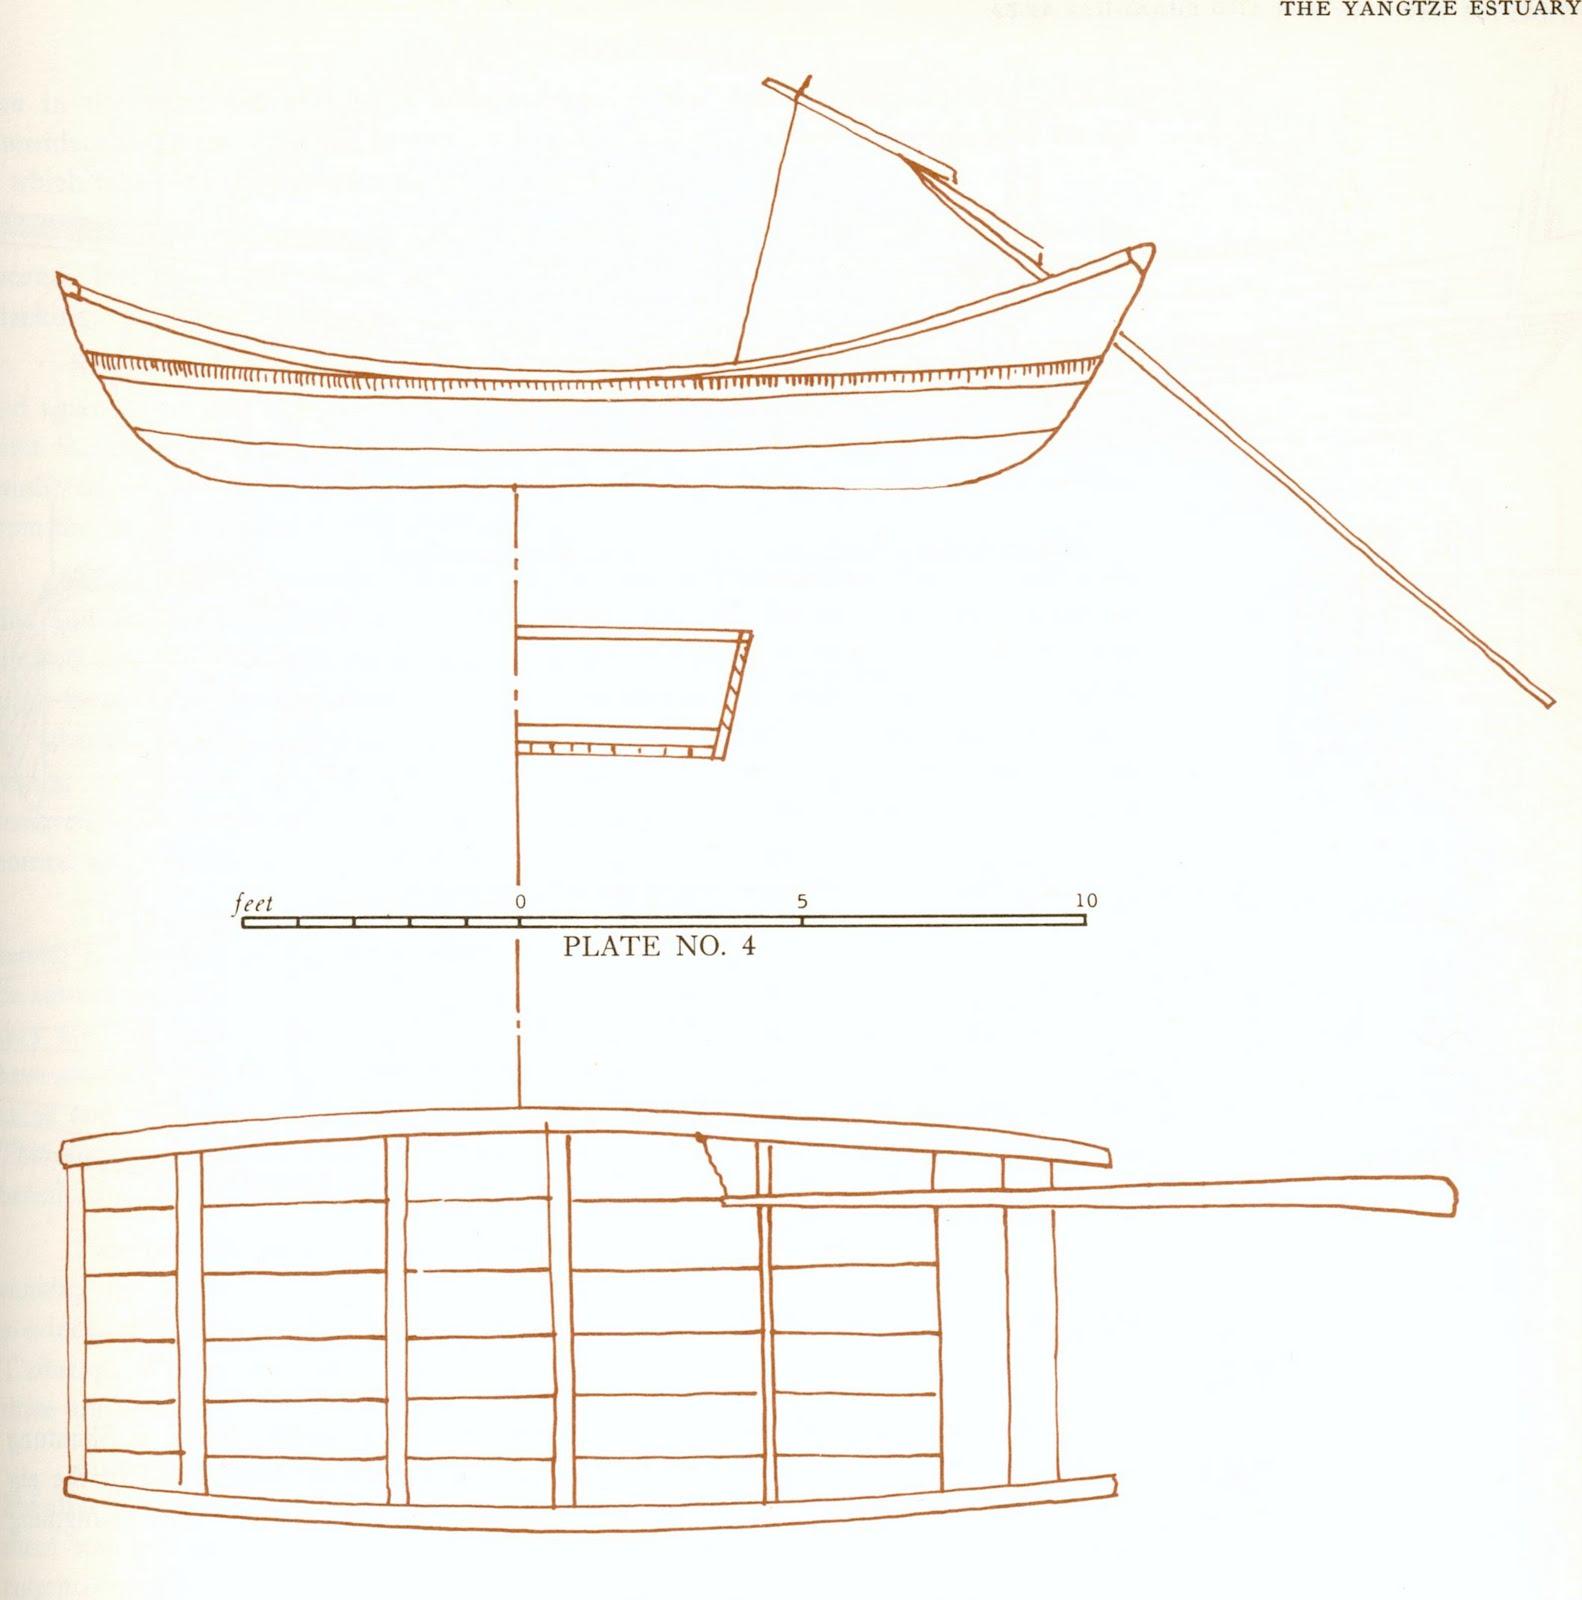 Push Boat Plans http://indigenousboats.blogspot.com/2010_04_01_archive ...